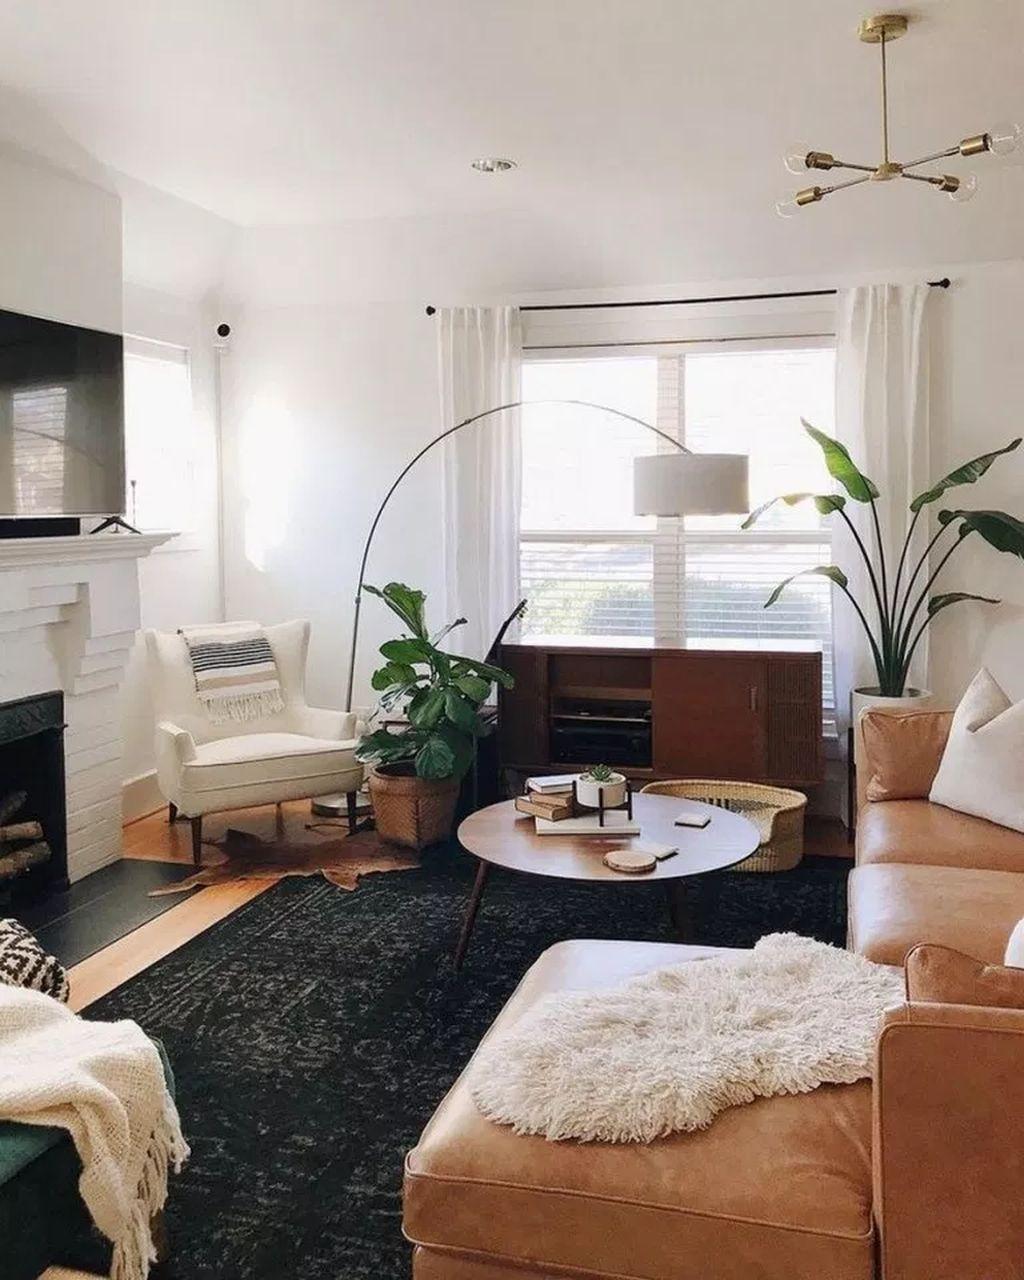 30 Marvelous Scandinavian Interior Design To Upgrade The Beautiful Of Your Living Comfy Living Room Design Living Room Scandinavian Family Living Room Design